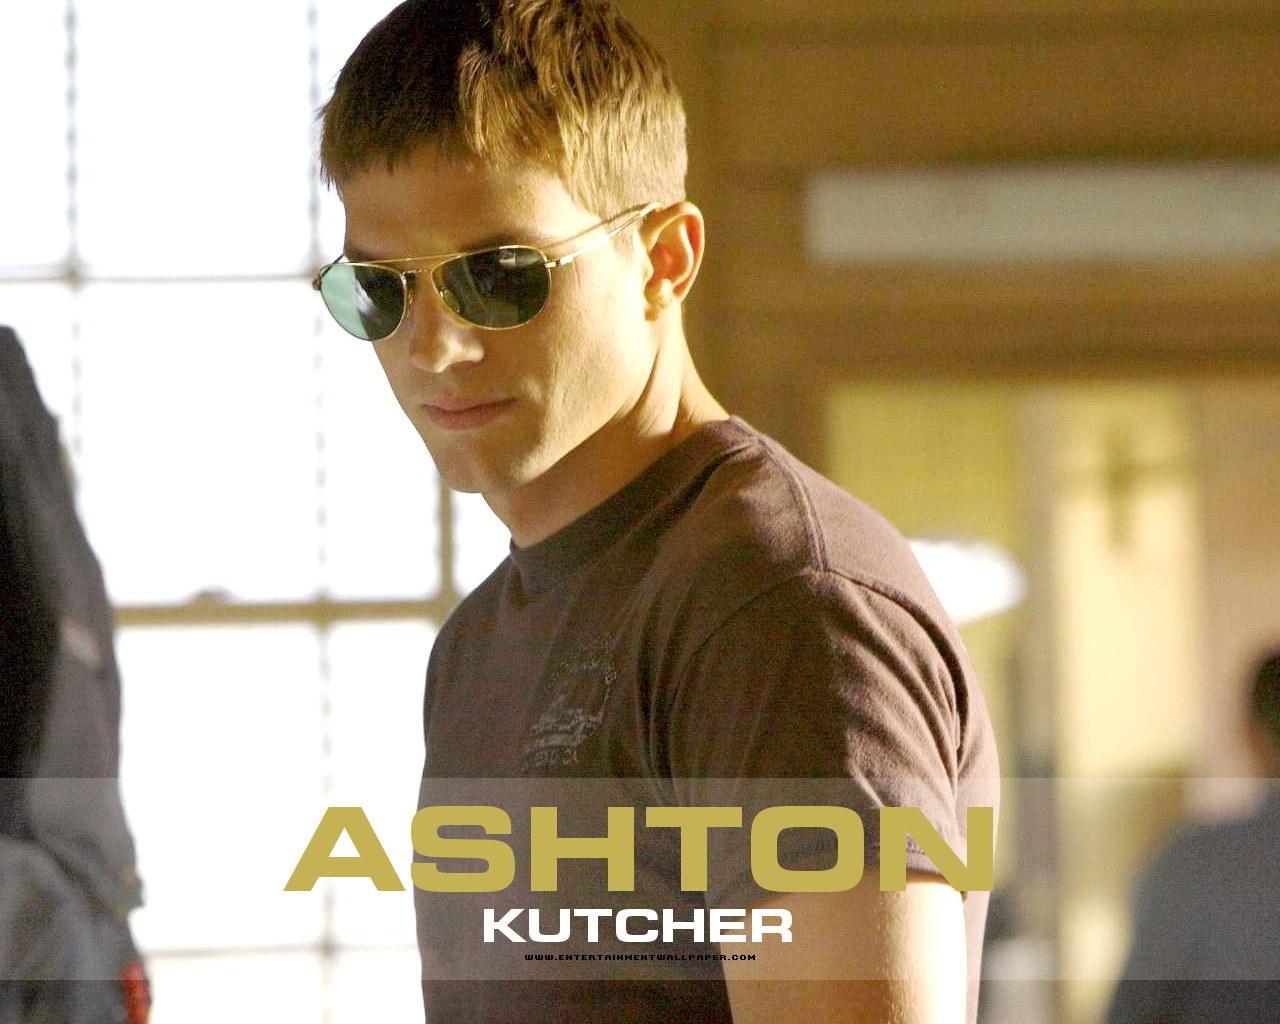 http://3.bp.blogspot.com/_dRwDJbOL9k4/SwwnvvAOFTI/AAAAAAAAB_8/somxRZ_x5Eg/s1600/Ashton-Kutcher%252B(5).jpg